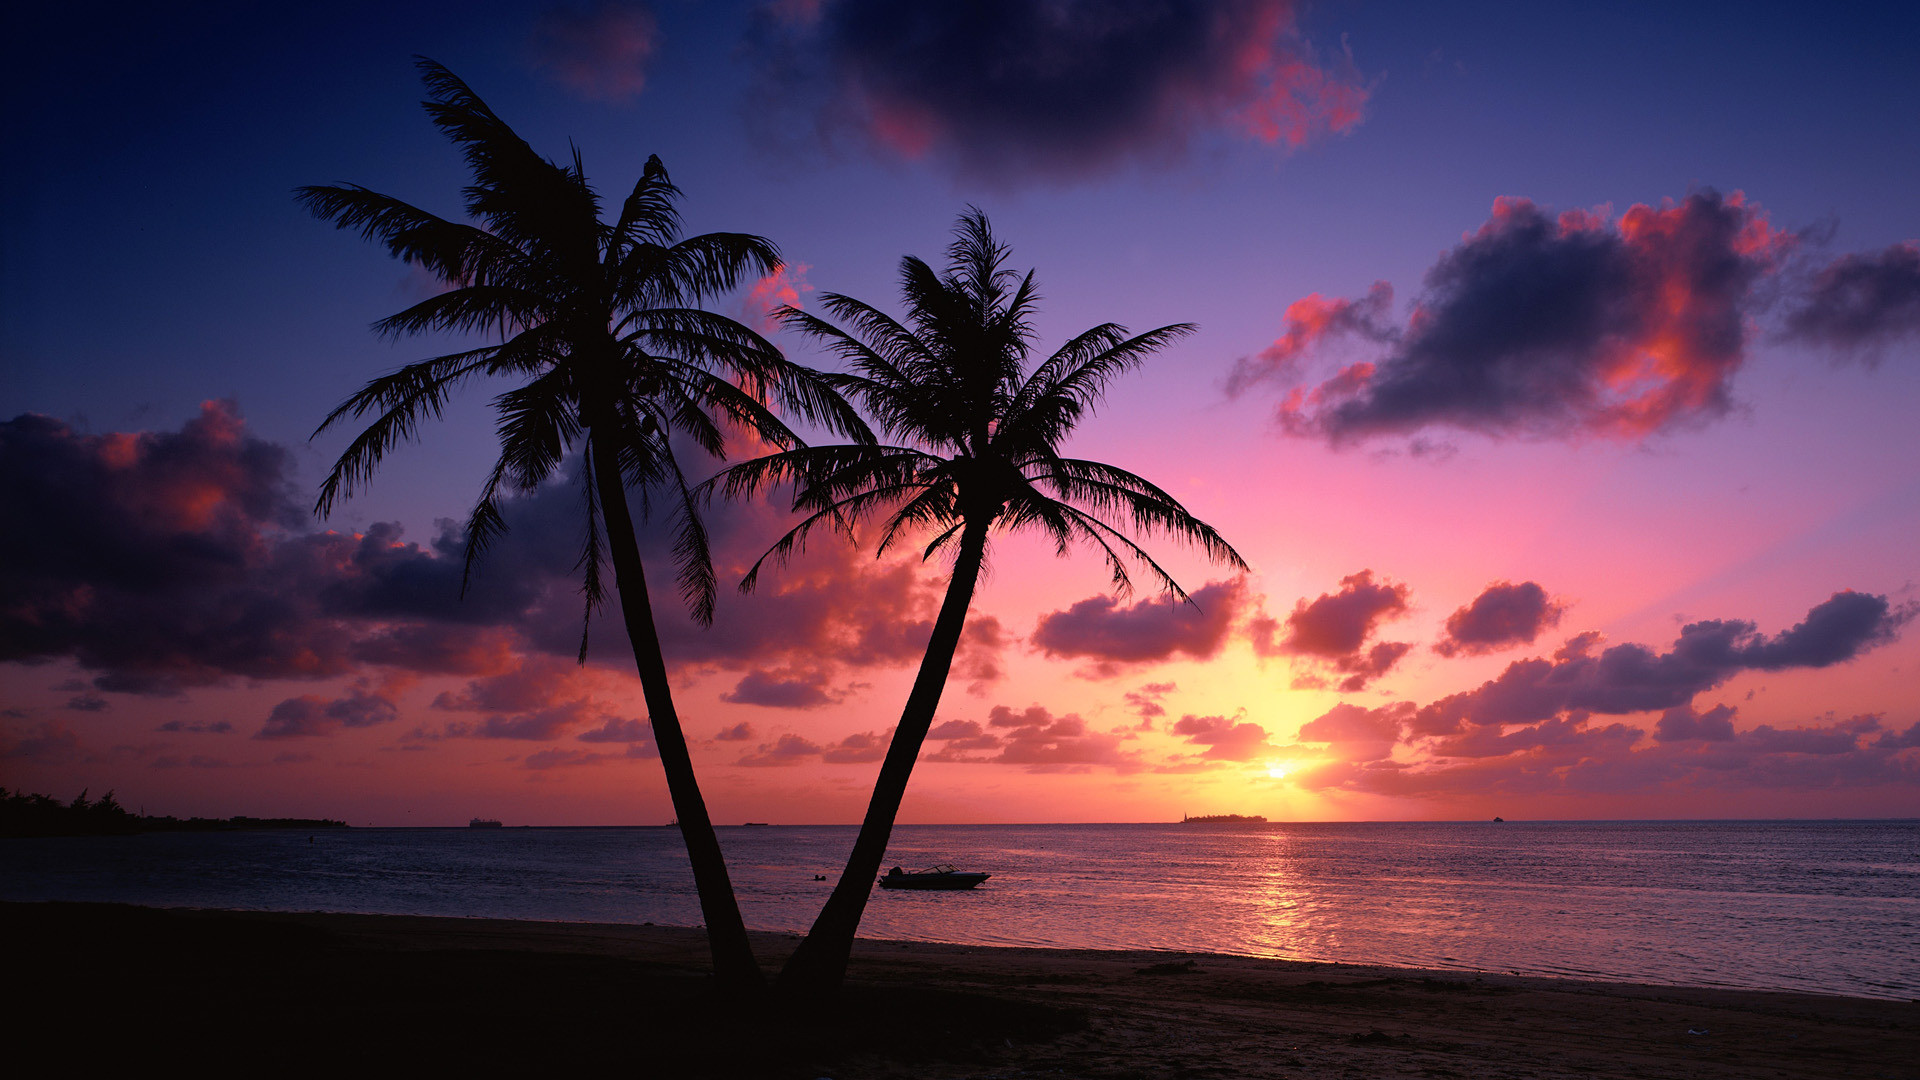 Beautiful Sunset Hd Wallpaper 80 Images